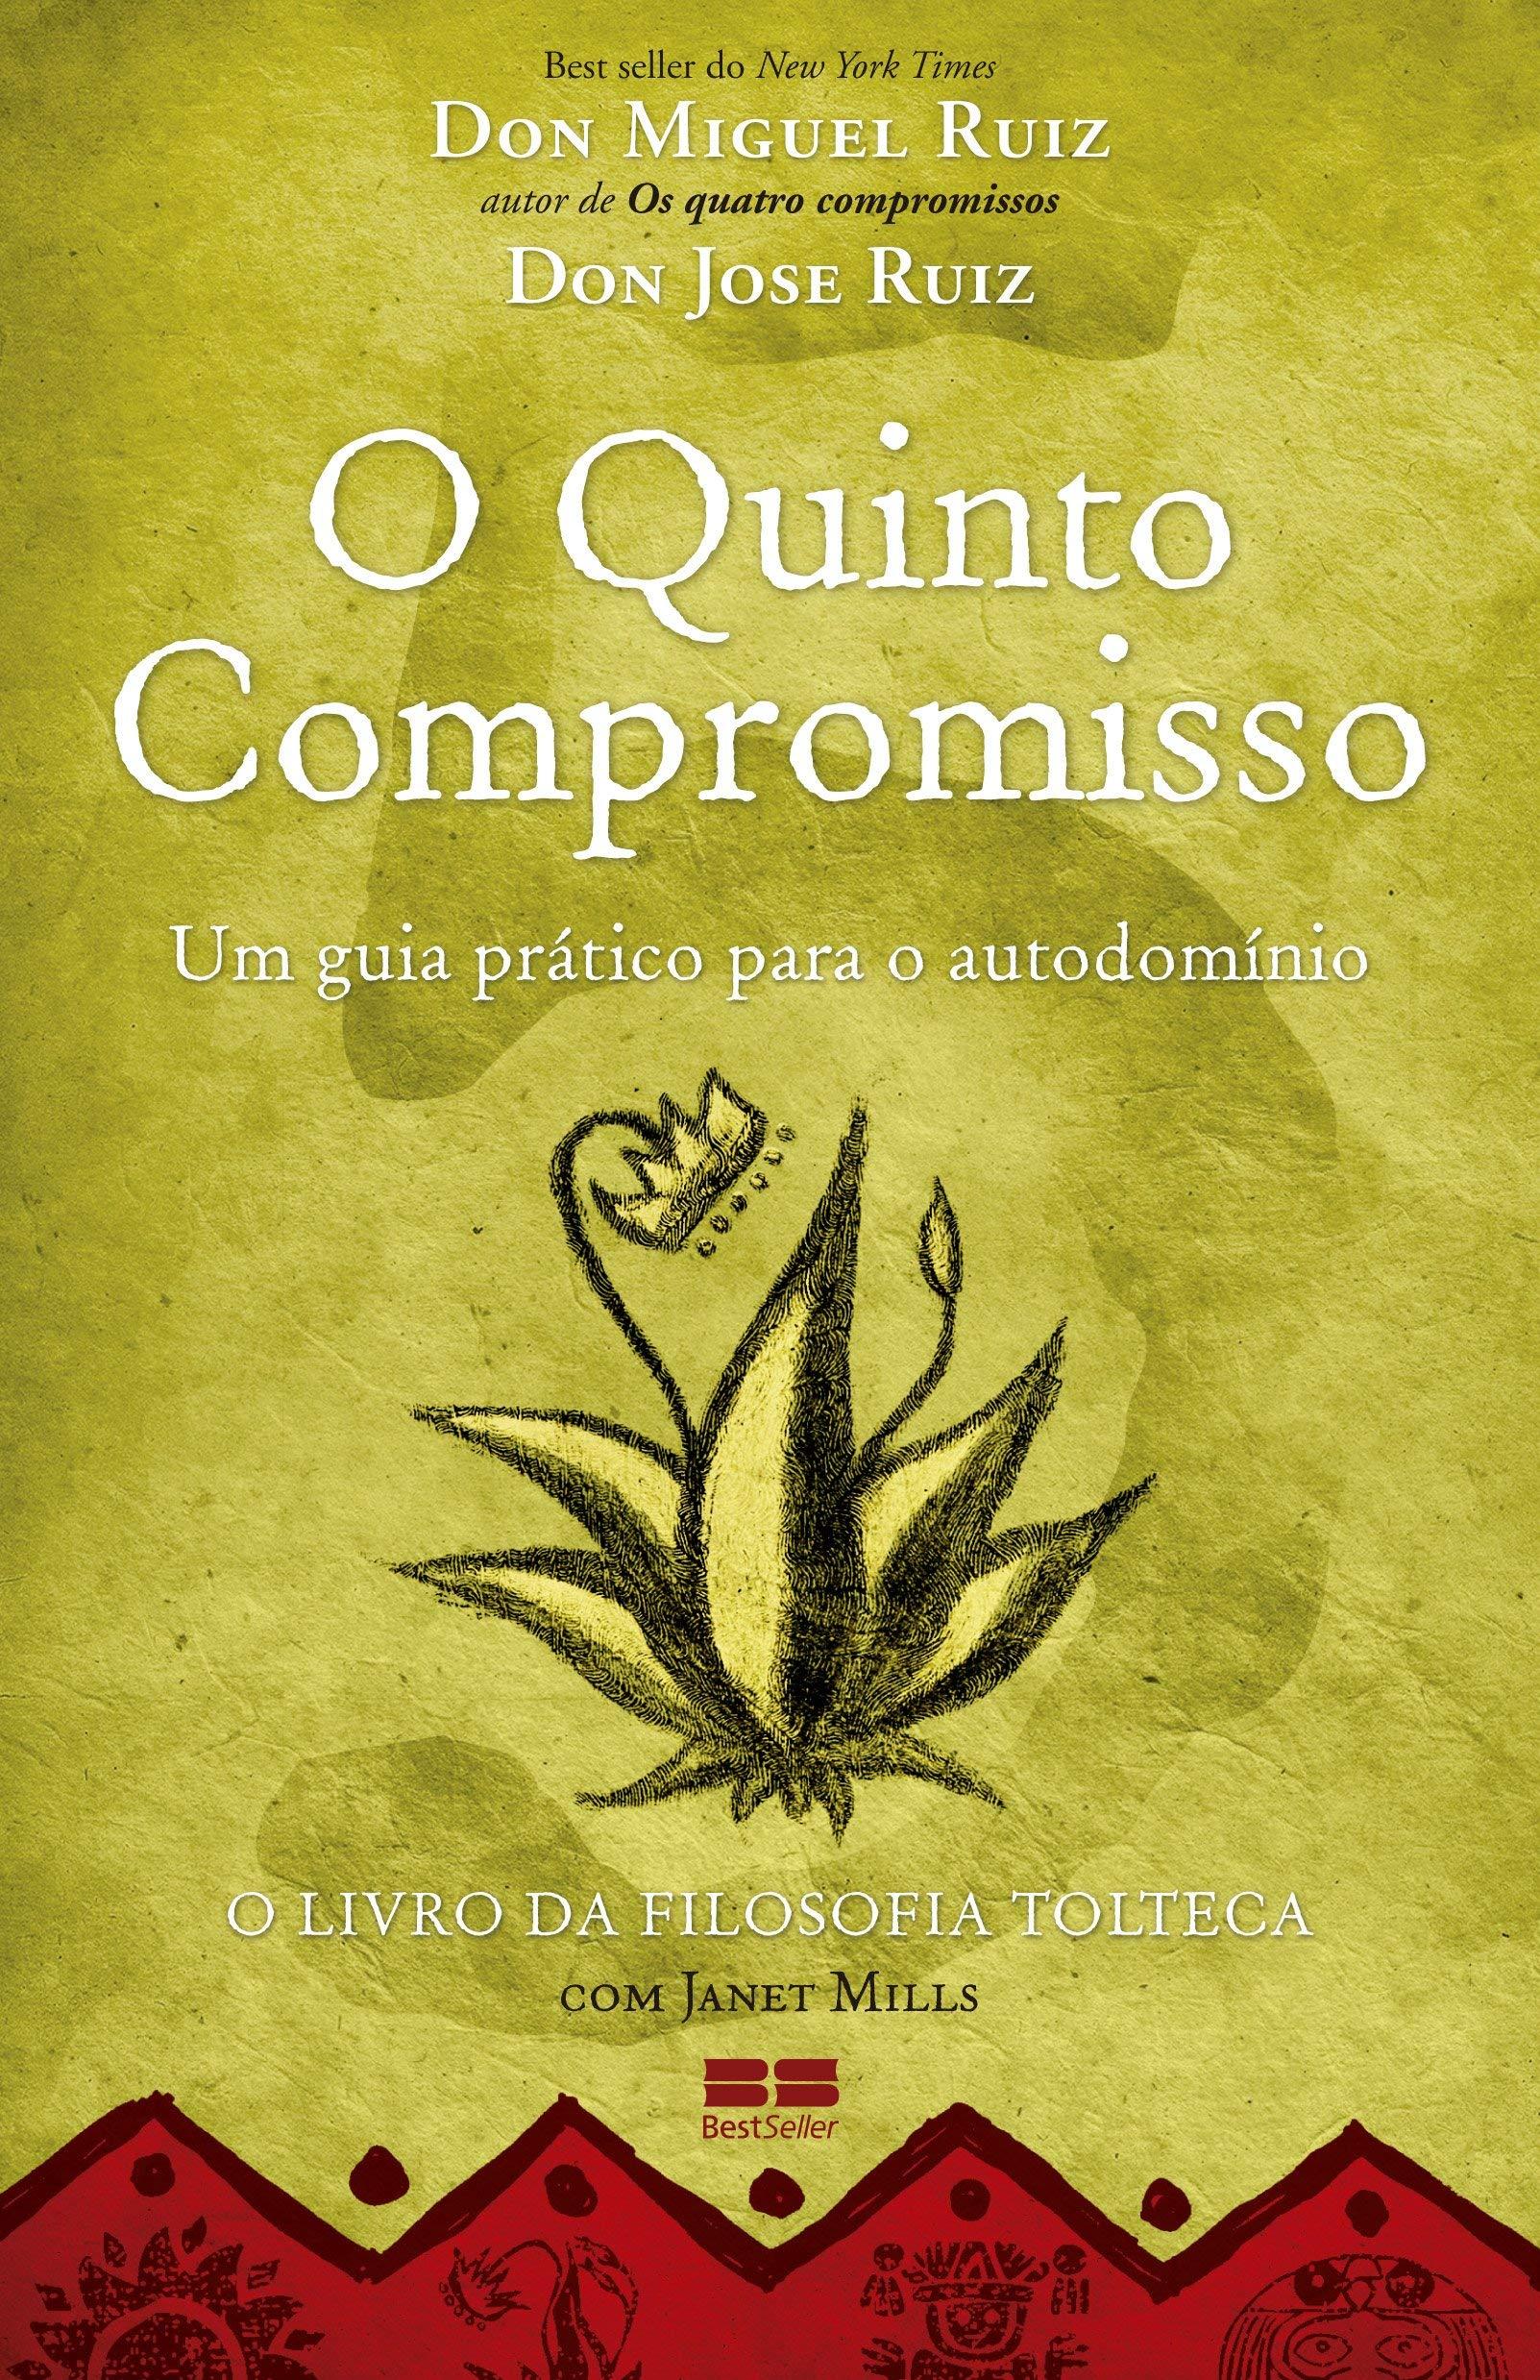 O quinto compromisso (Don Jose Ruiz)